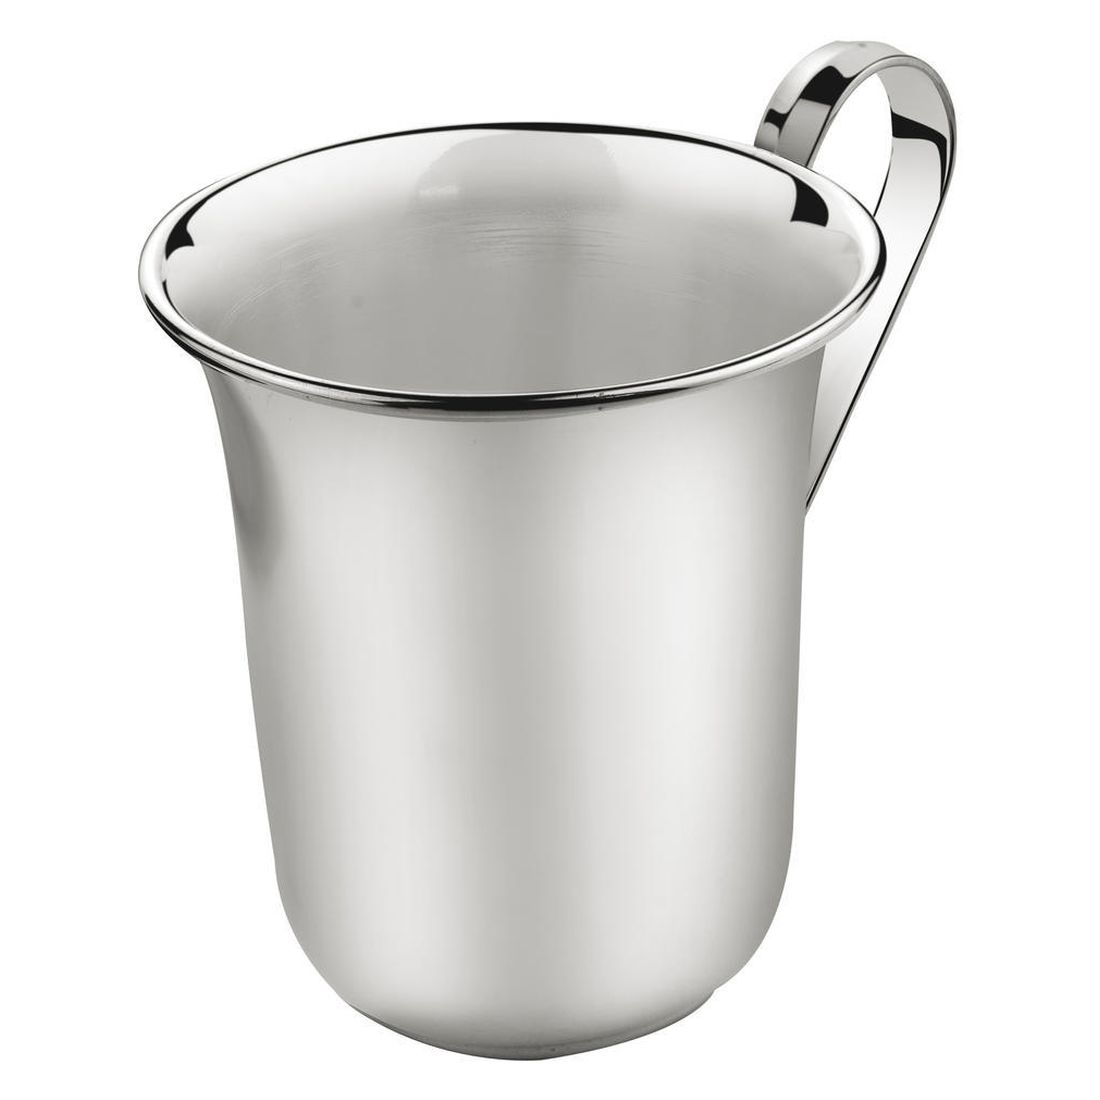 Kinderbecher Tulpenfom/Henkel – Versilbert – Silber, Zilverstad online kaufen